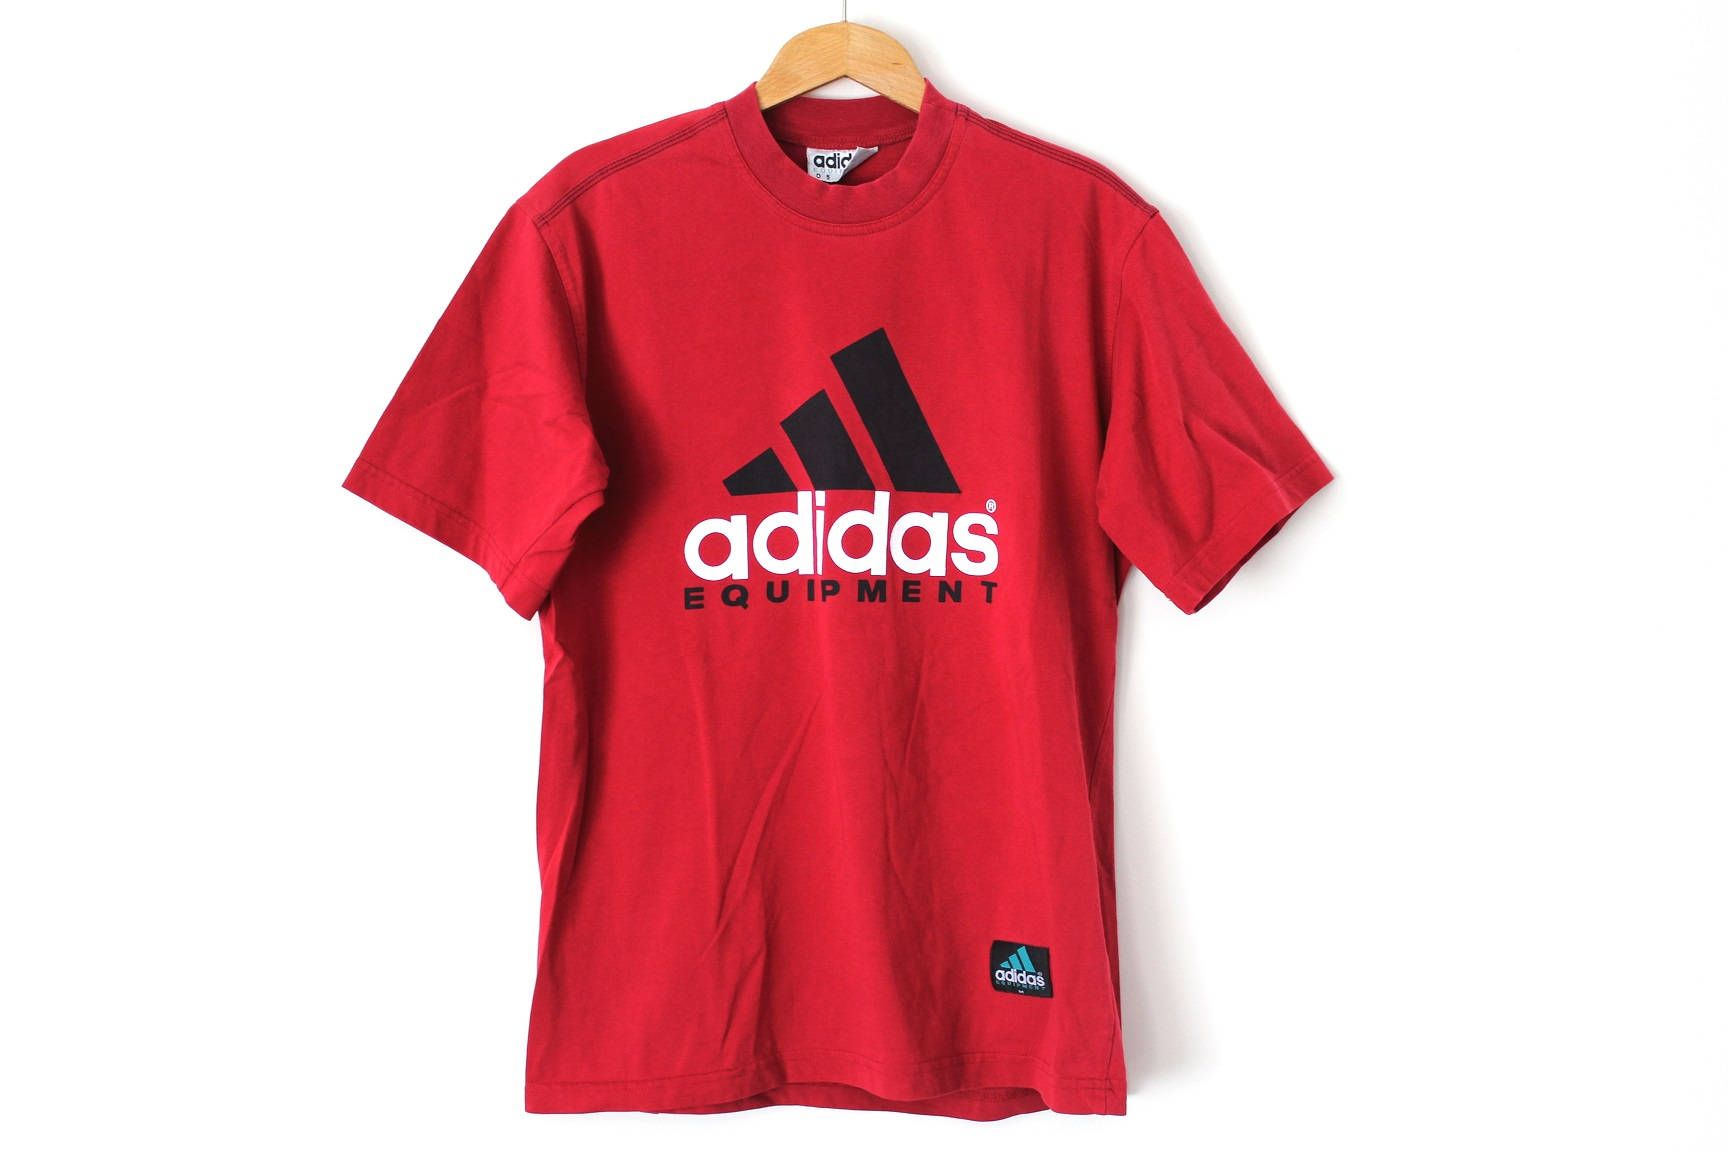 Vintage Adidas Equipment T Shirt Red Shirt Short Sleeve Tshirt Sportswear Top Activewear Big Logo Size M Vintage Adidas Shirts Adidas Sportswear [ 1152 x 1728 Pixel ]